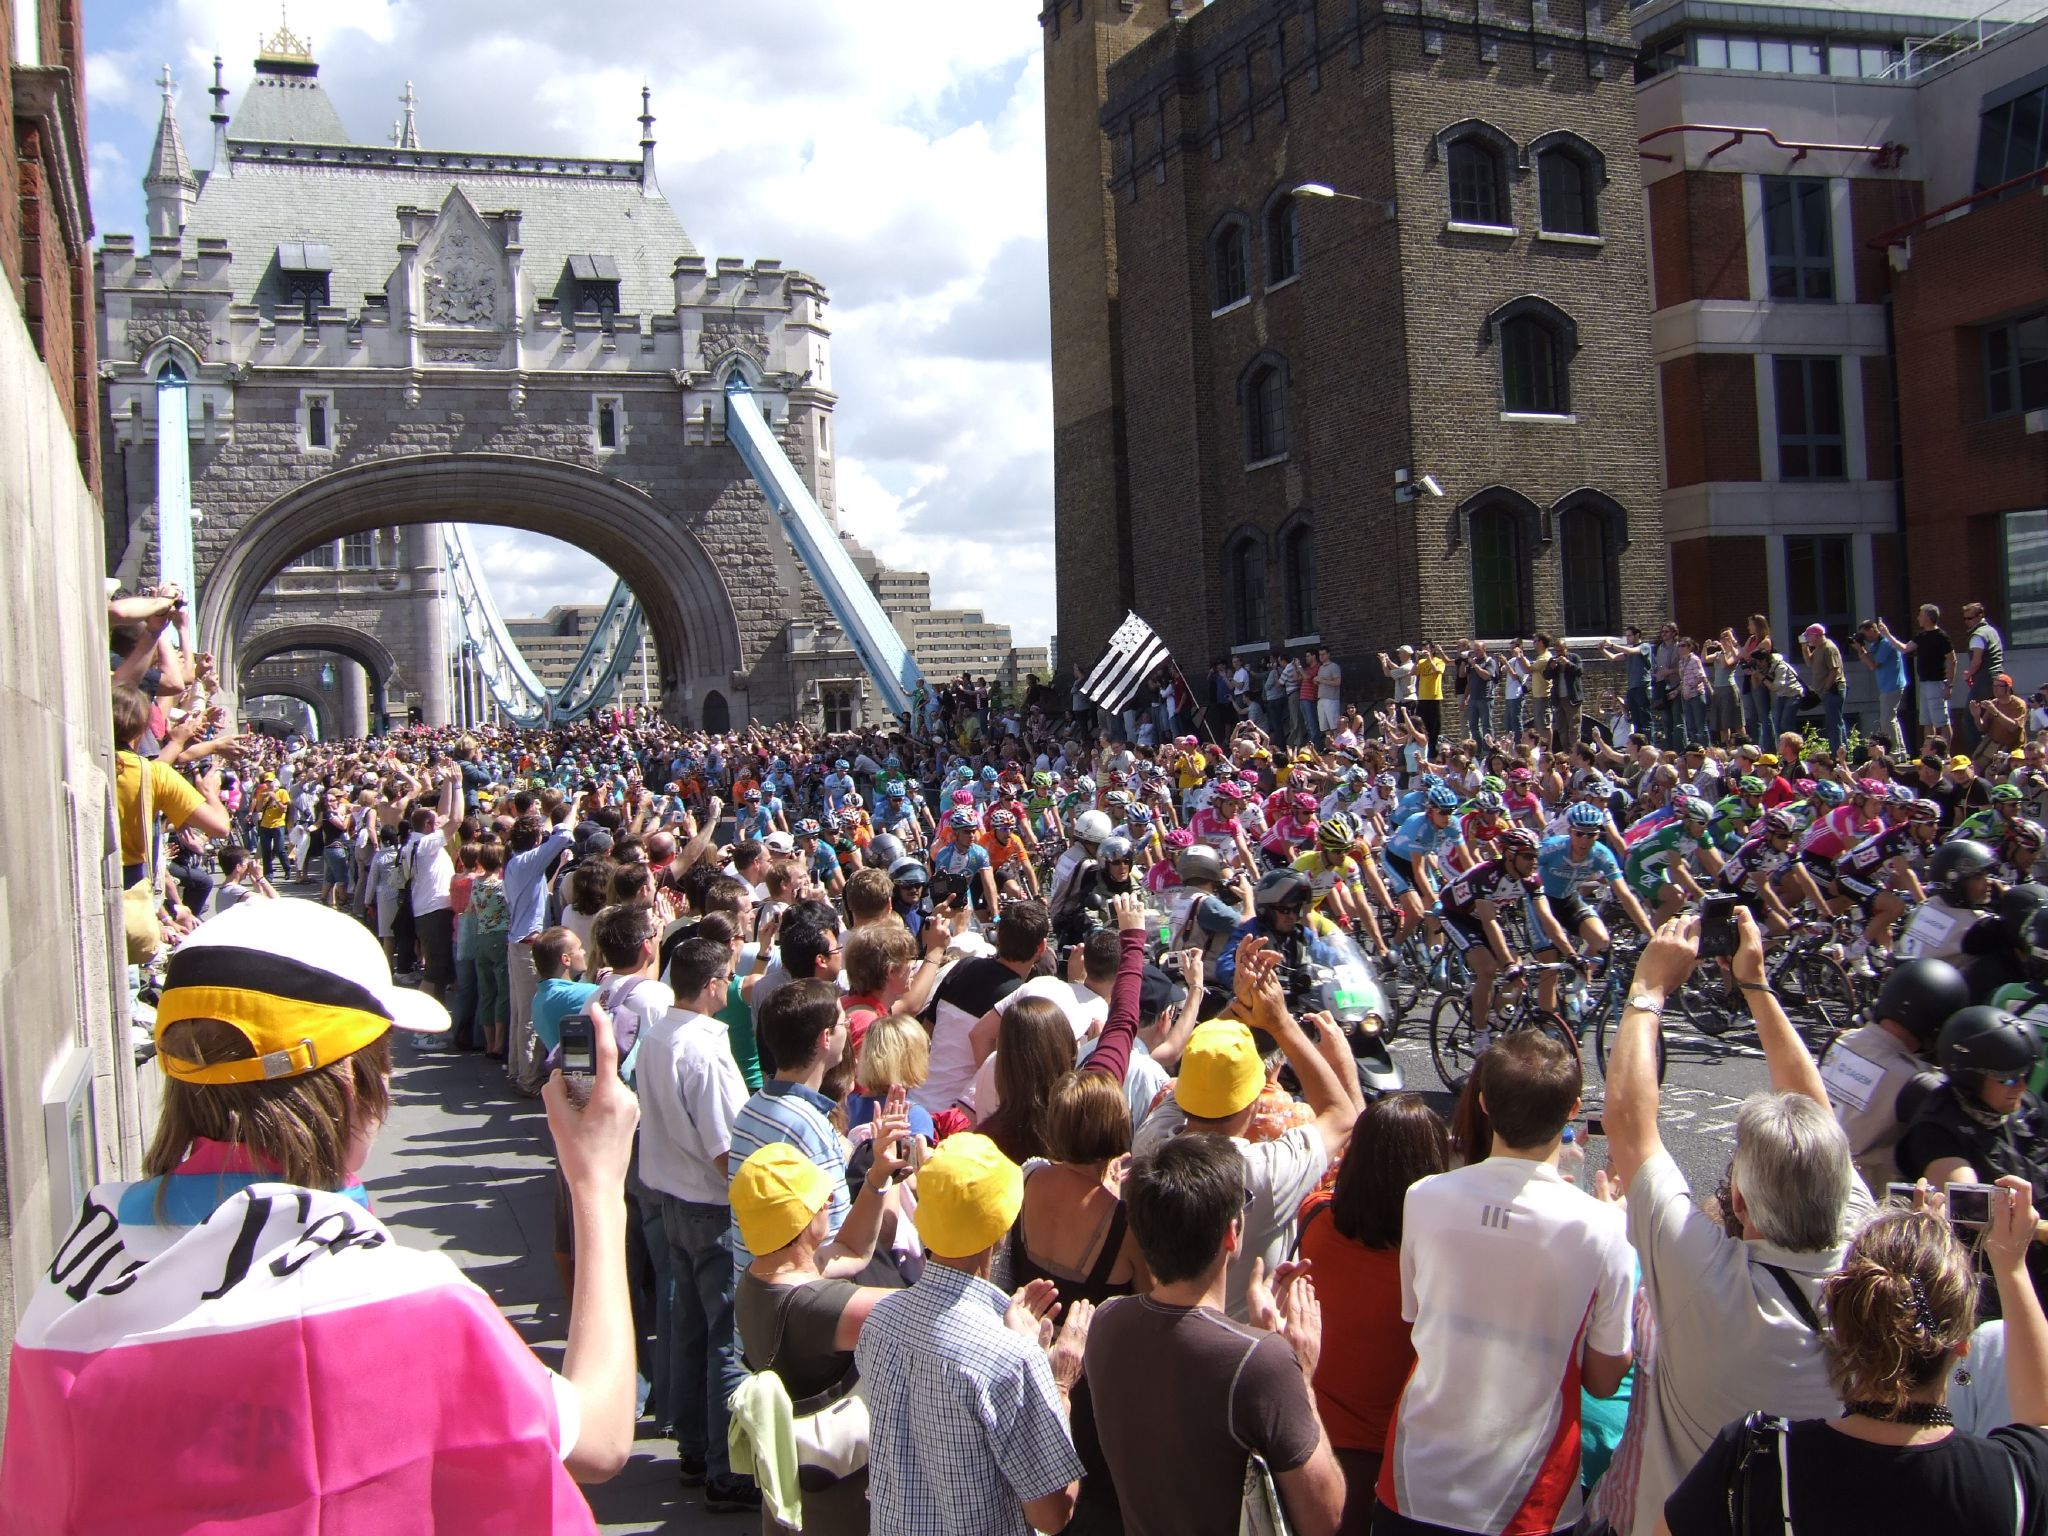 upload.wikimedia.org/wikipedia/commons/8/84/Tour_de_France_through_London_2007_Tower_Bridge.jpg